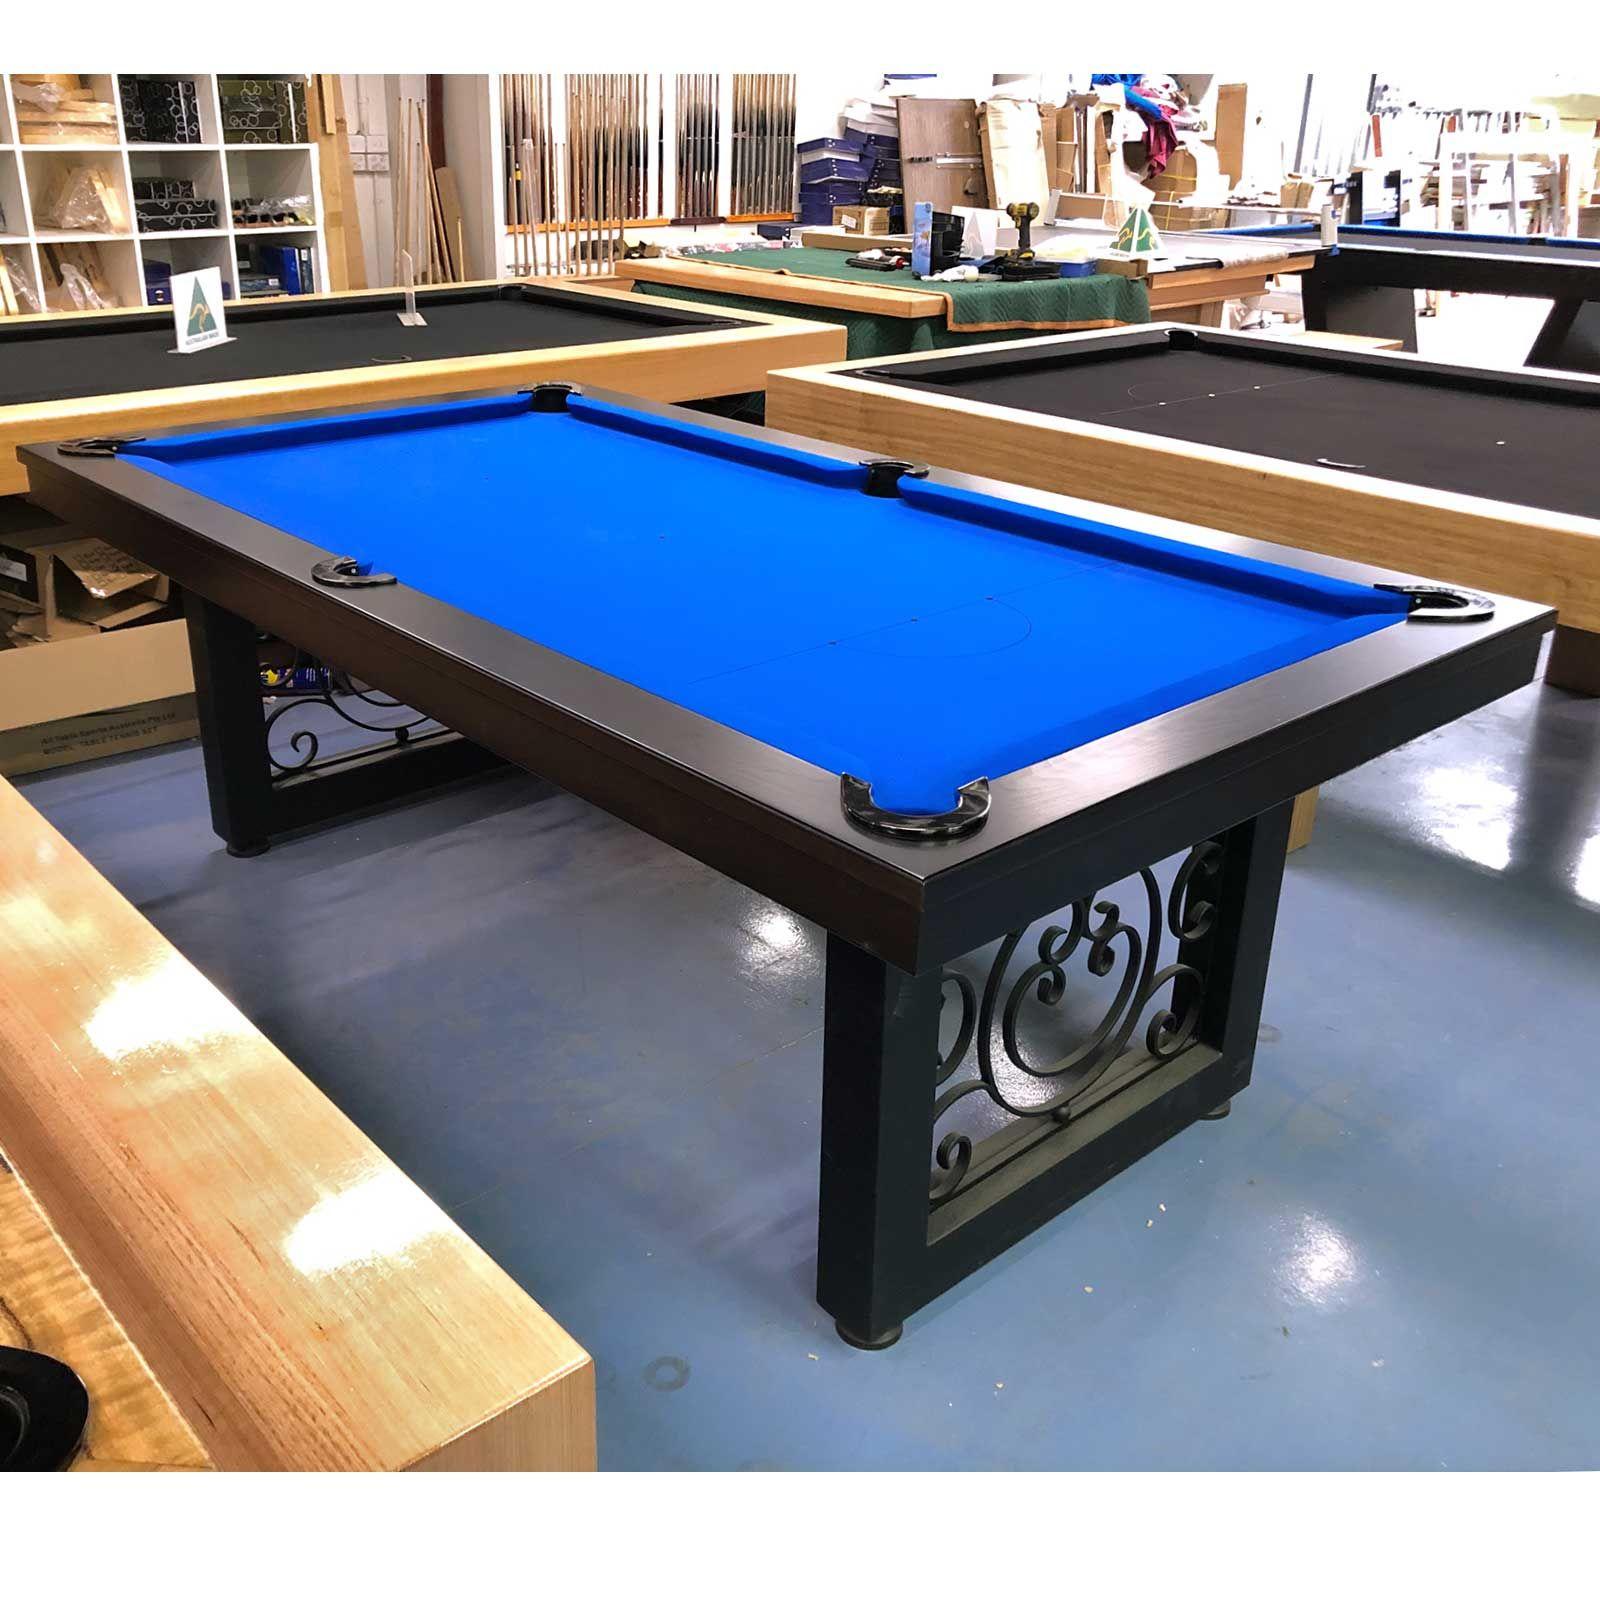 7 Foot Slate Odyssey Pool Billiards Table In 2020 Billiard Table Billiards Modern Pools